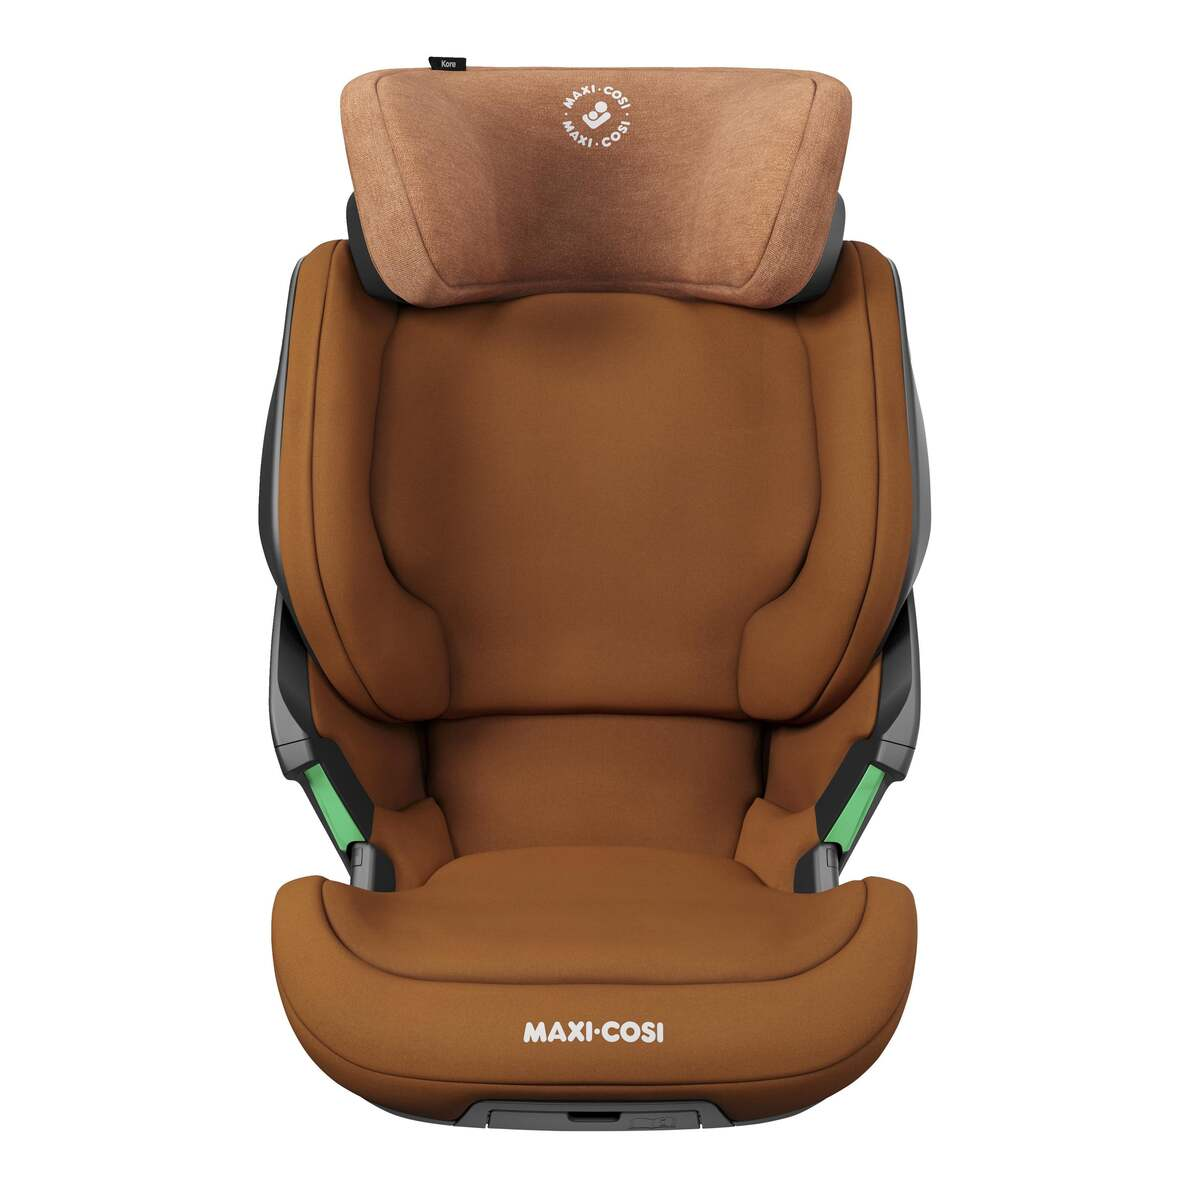 "Bild 1 von Maxi-Cosi Auto-Kindersitz ""Kore i-Size"", Authentic Cognac"